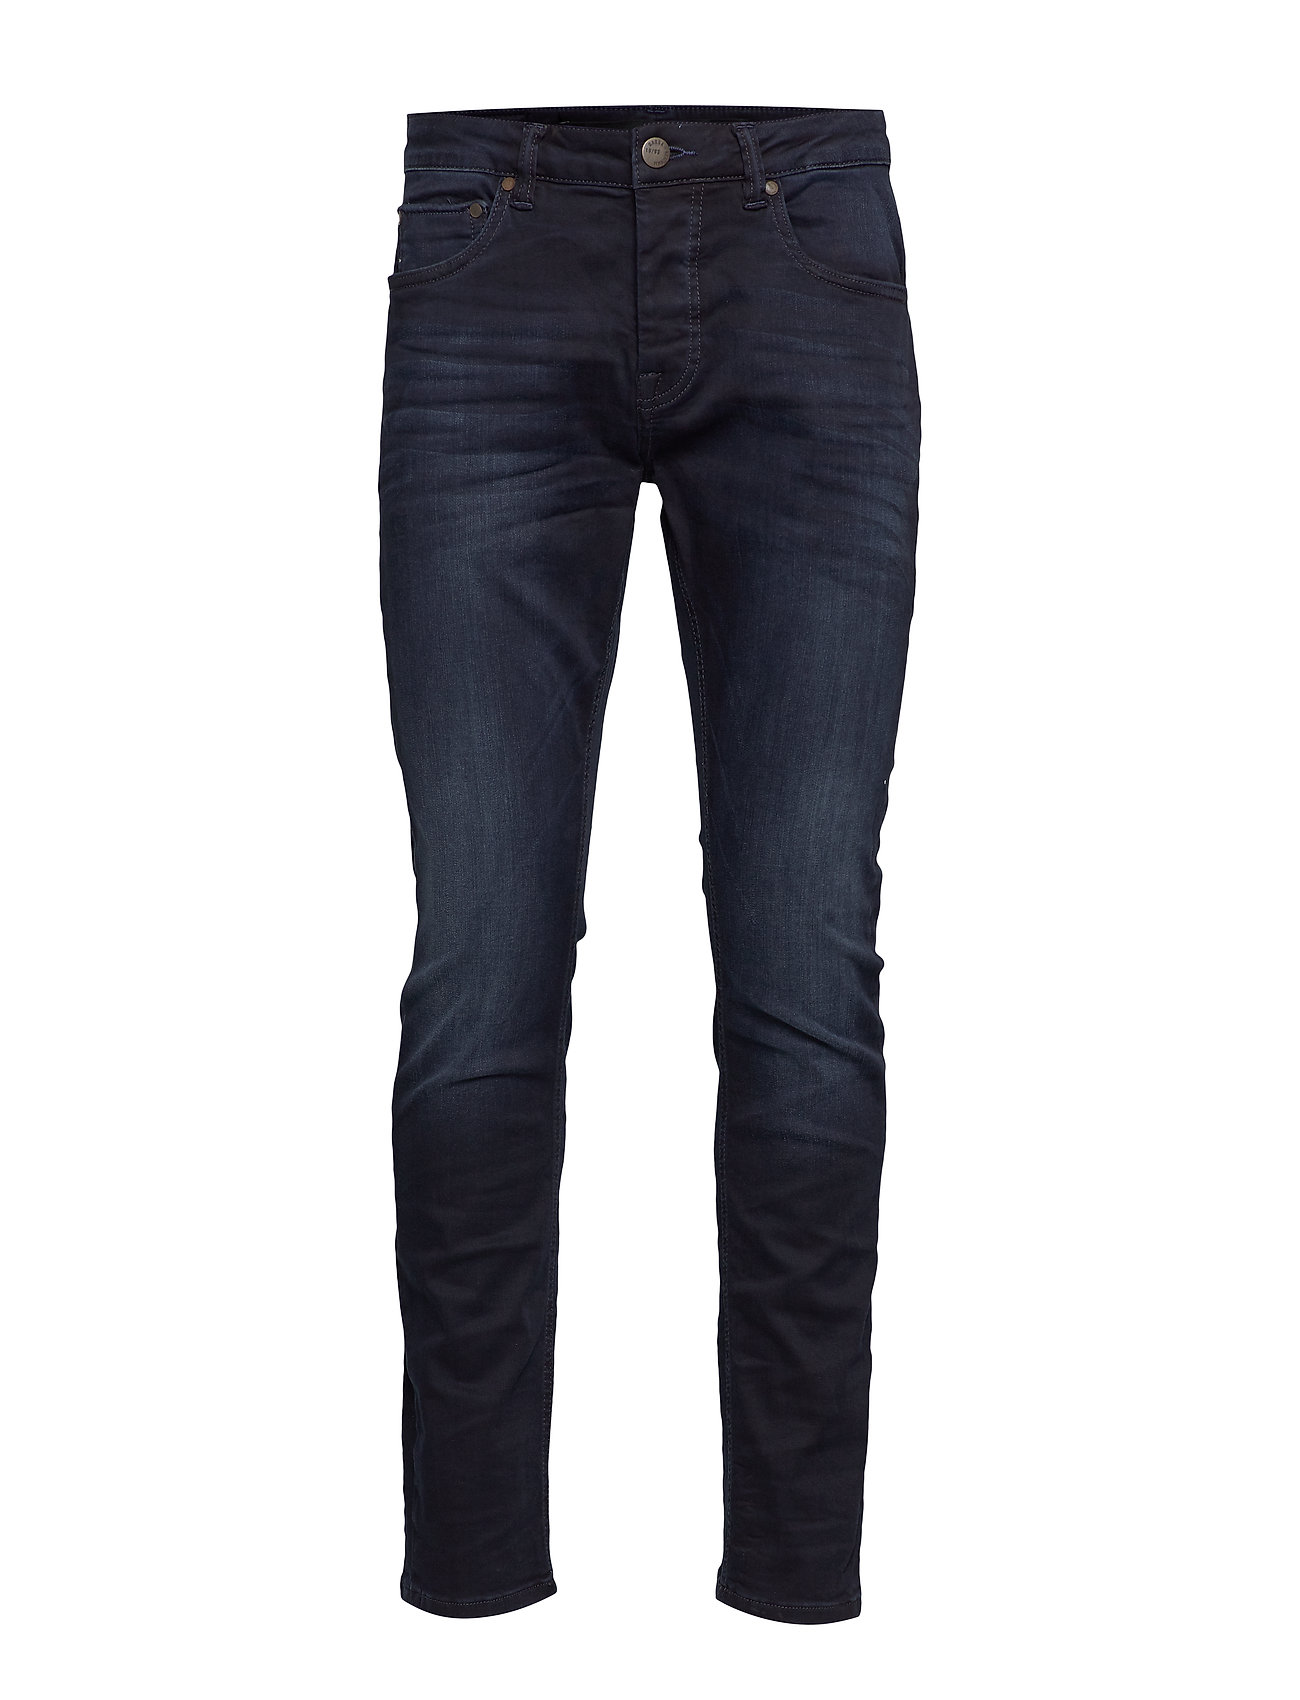 Image of J S K2291 Slim Jeans Blå Gabba (3434805611)